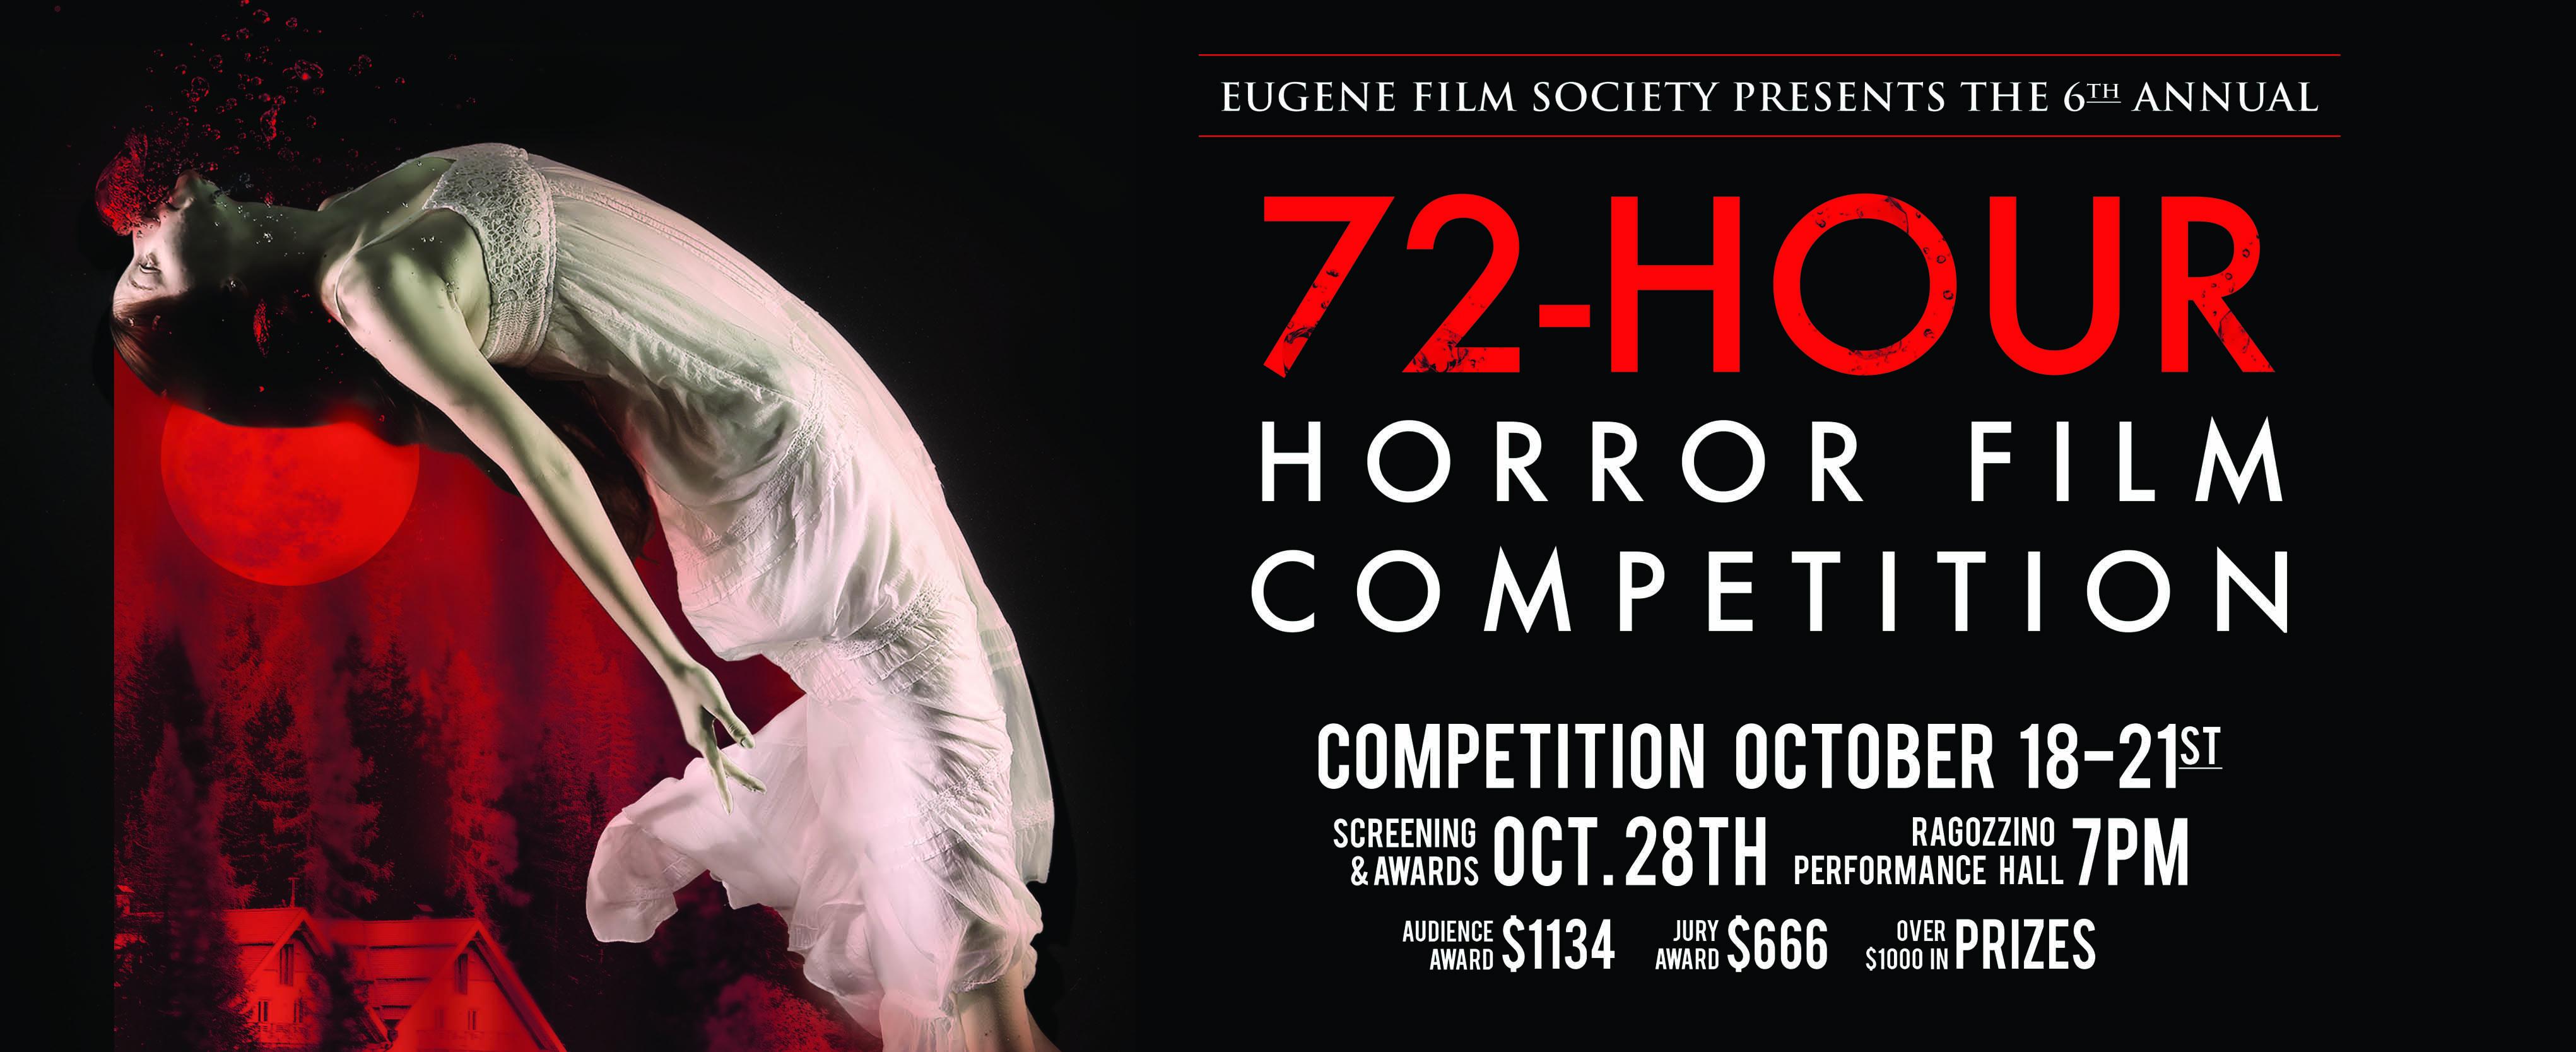 Eugene Film Society 72-Hour Horror Competition